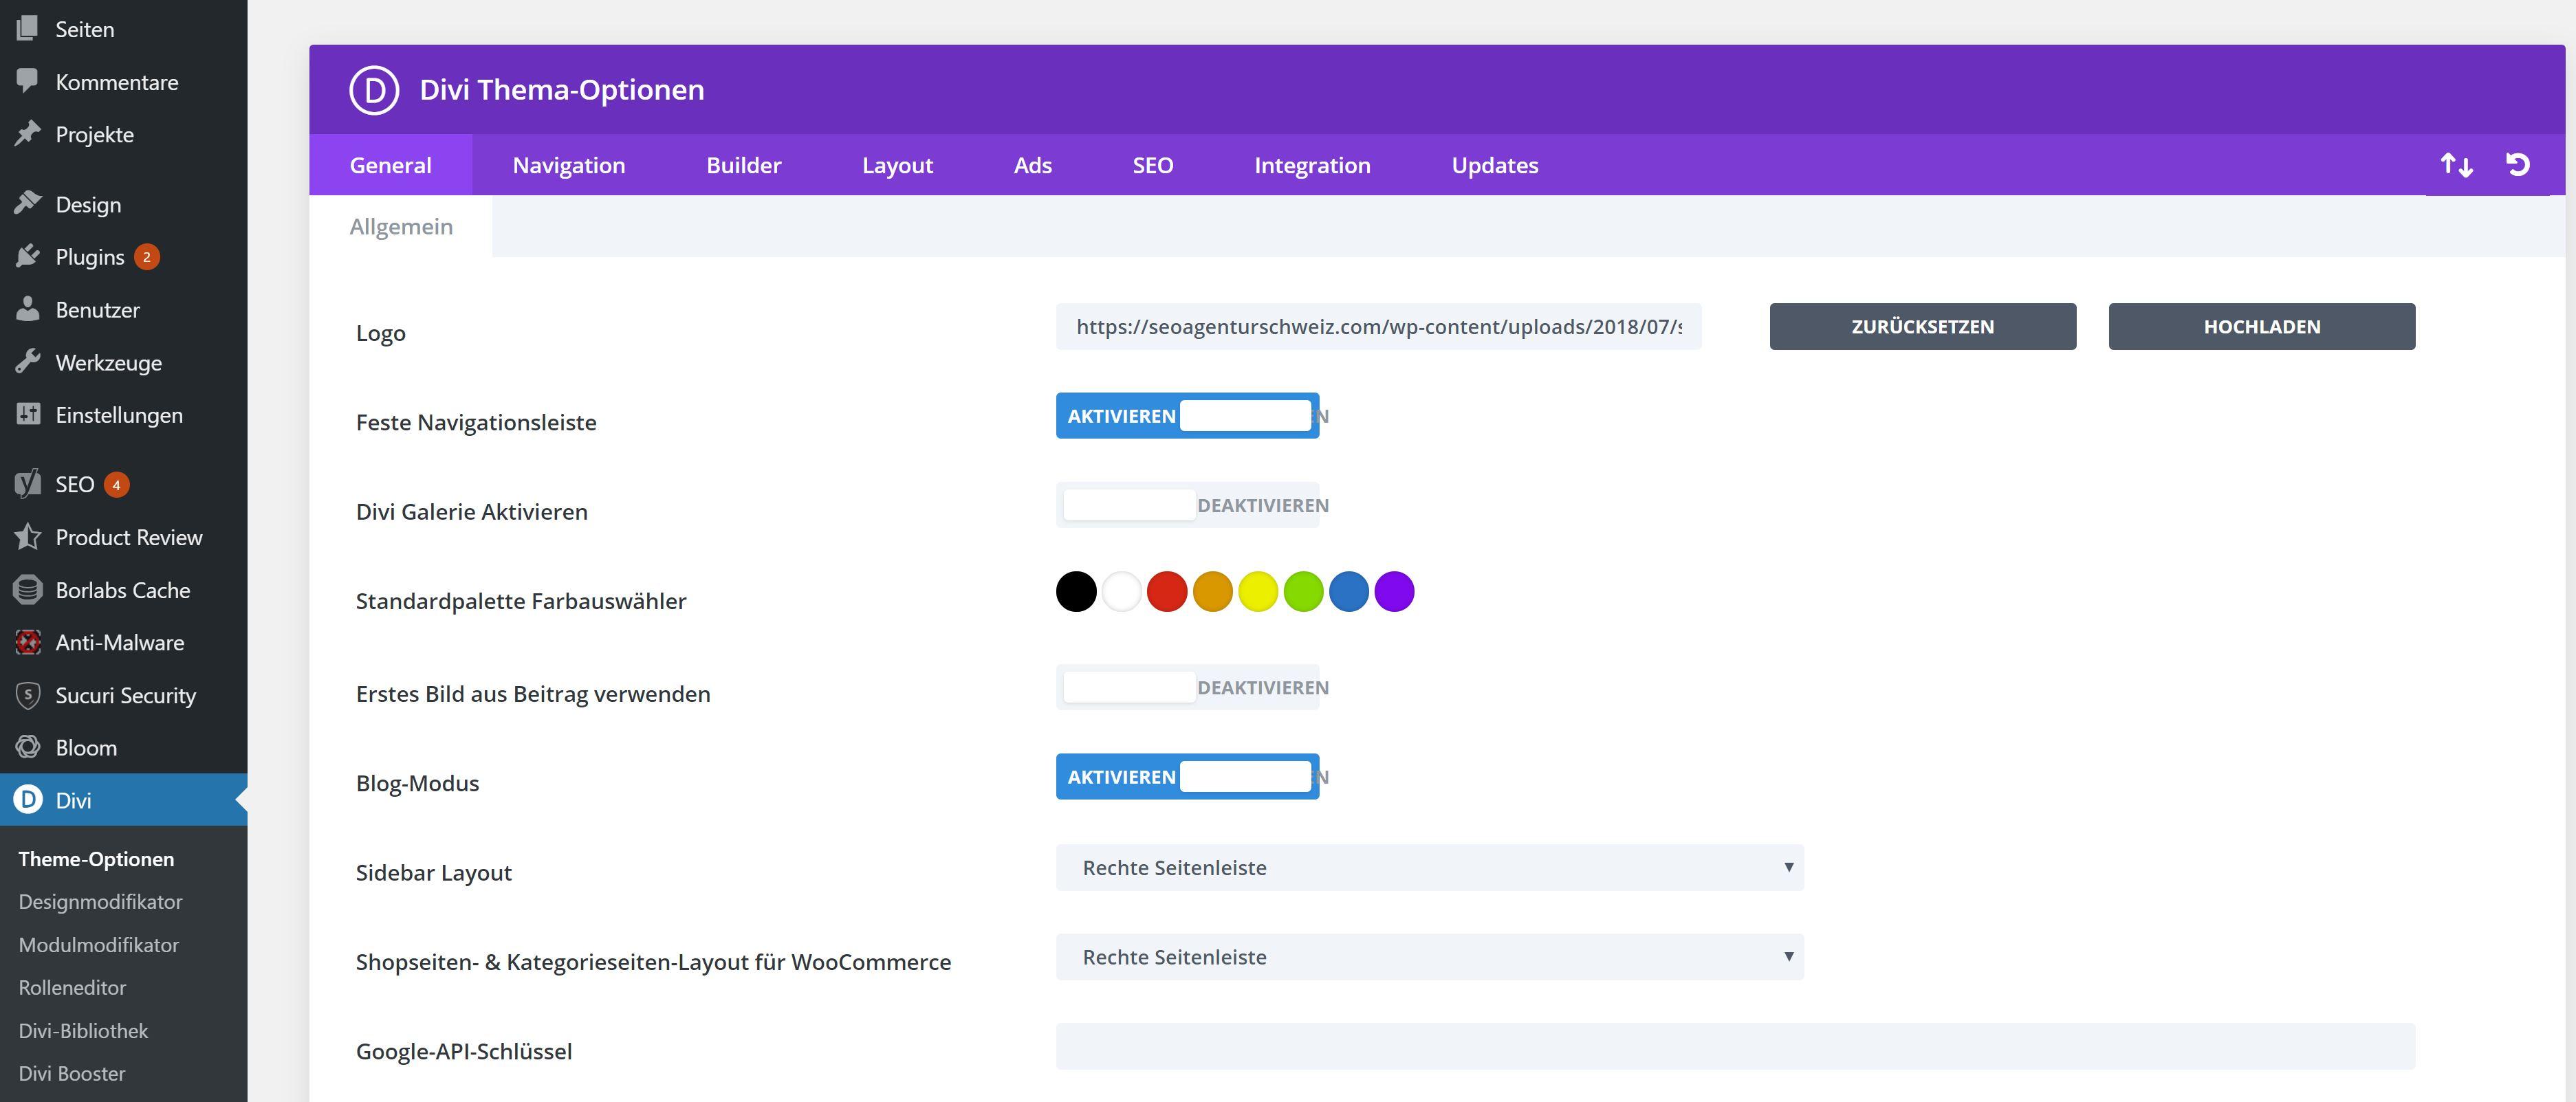 Divi Experience 2019🤔 - WordPress PageBuilder Flop or